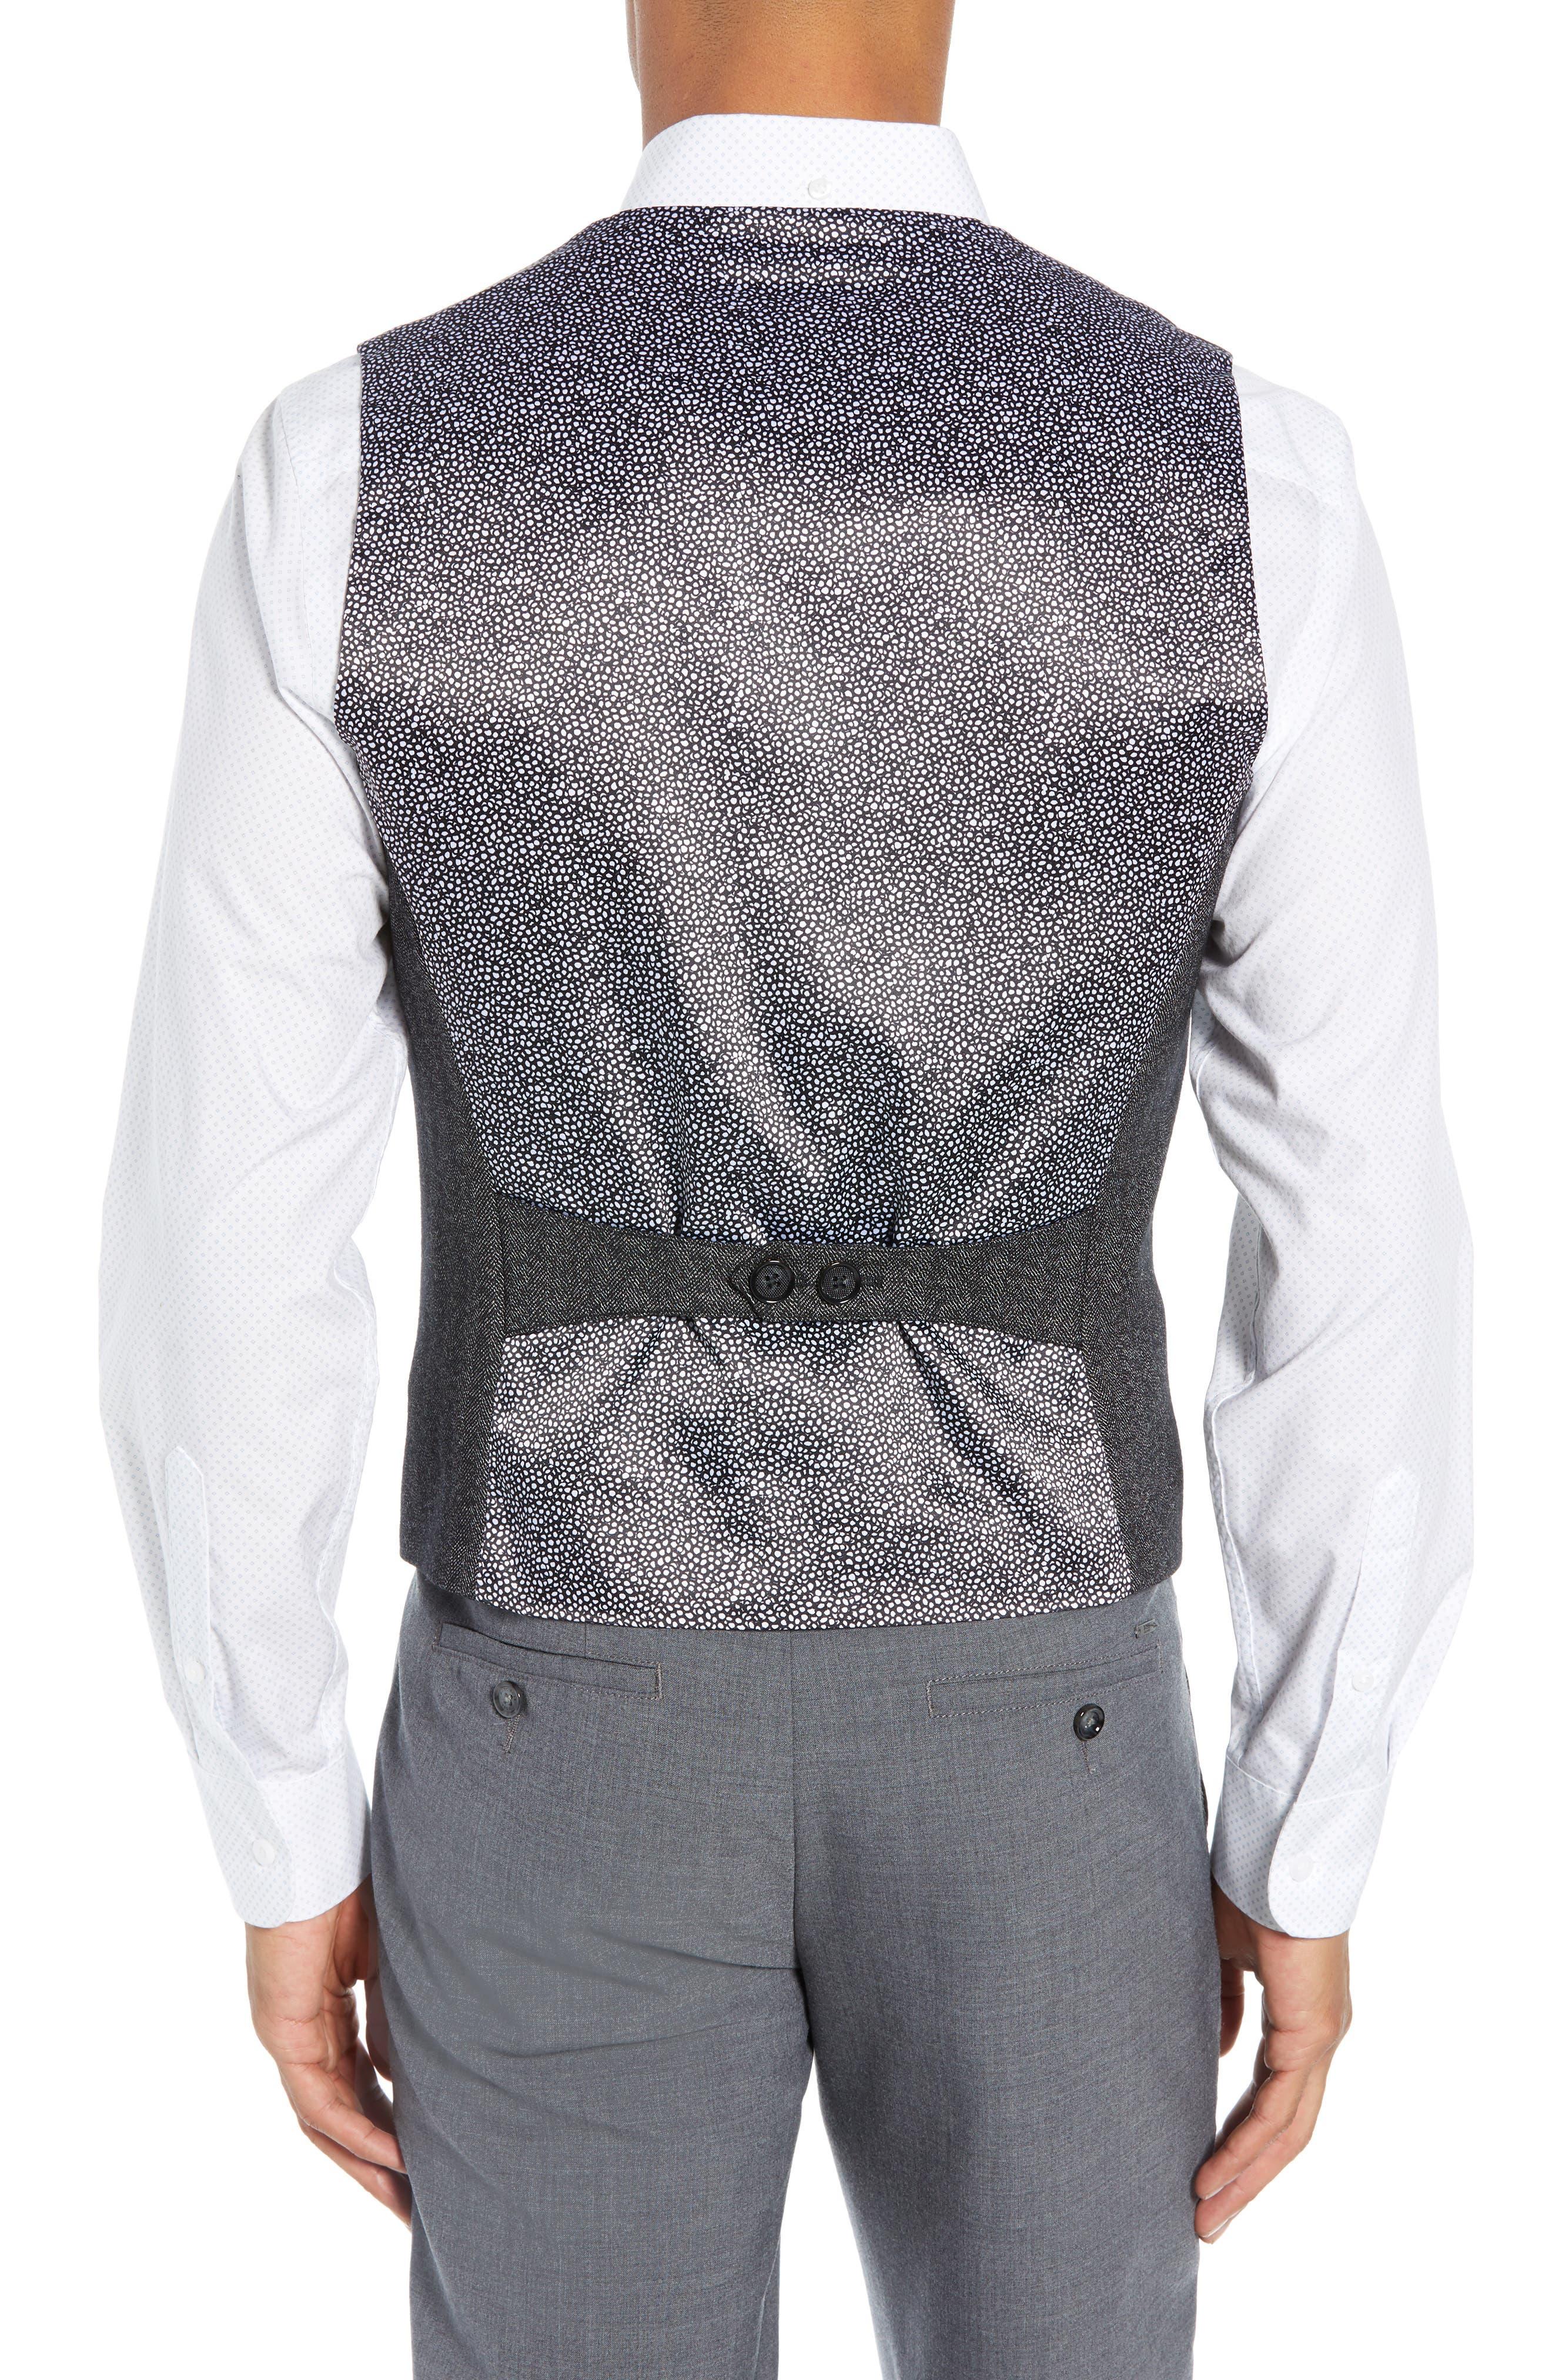 Wenswai Slim Vest,                             Alternate thumbnail 2, color,                             CHARCOAL